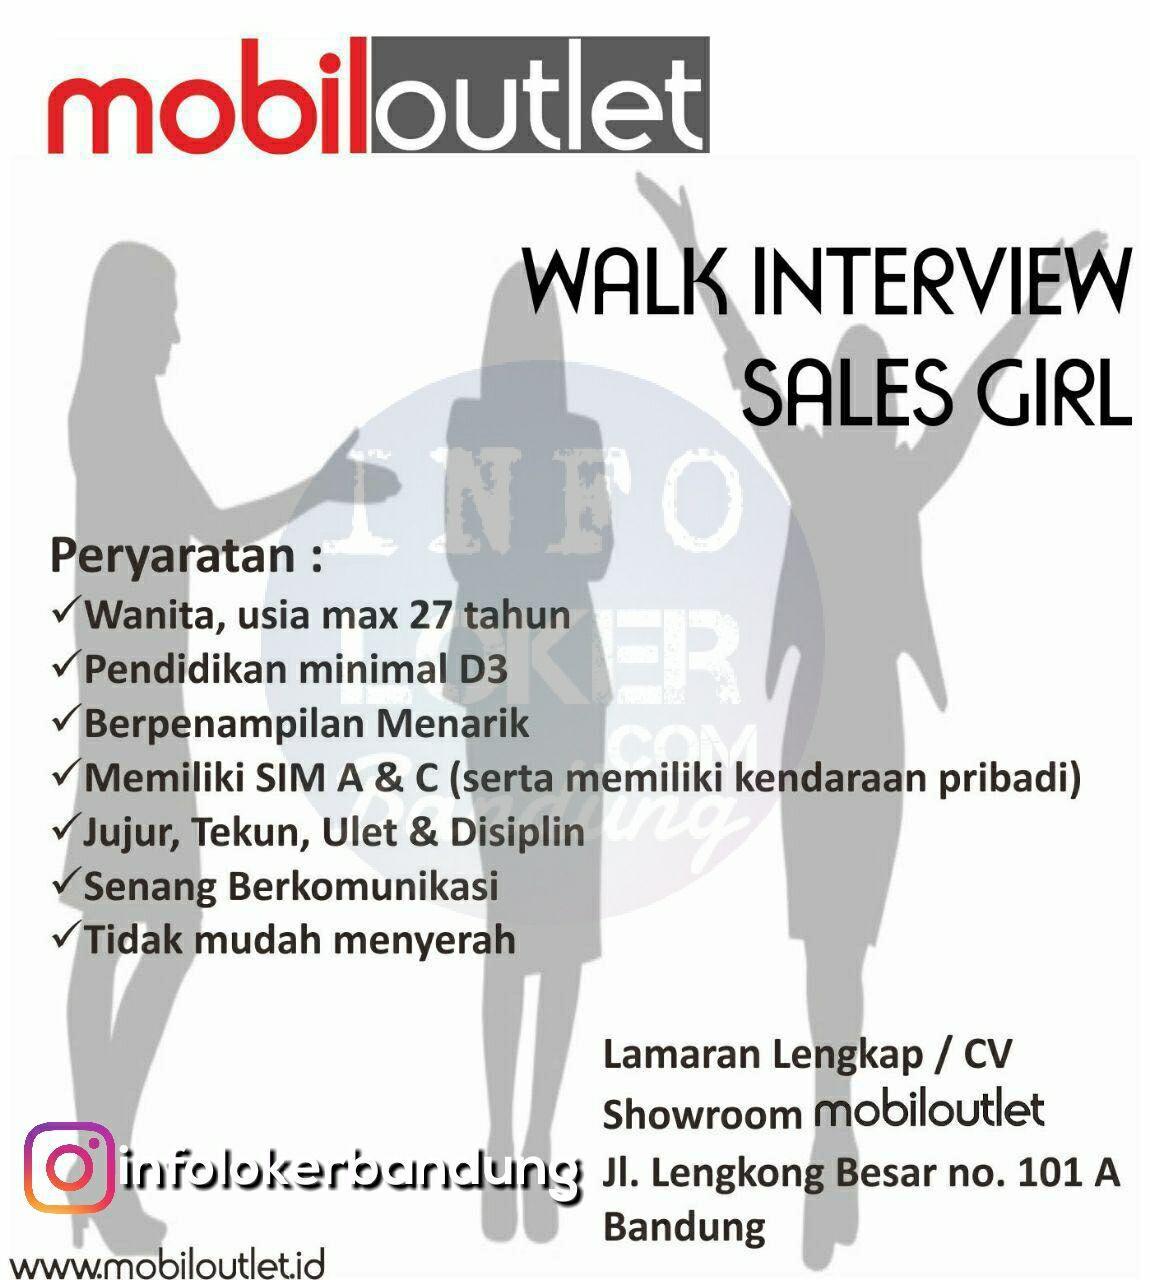 Walk In Interview Mobil Outlet Bandung Oktober 2017